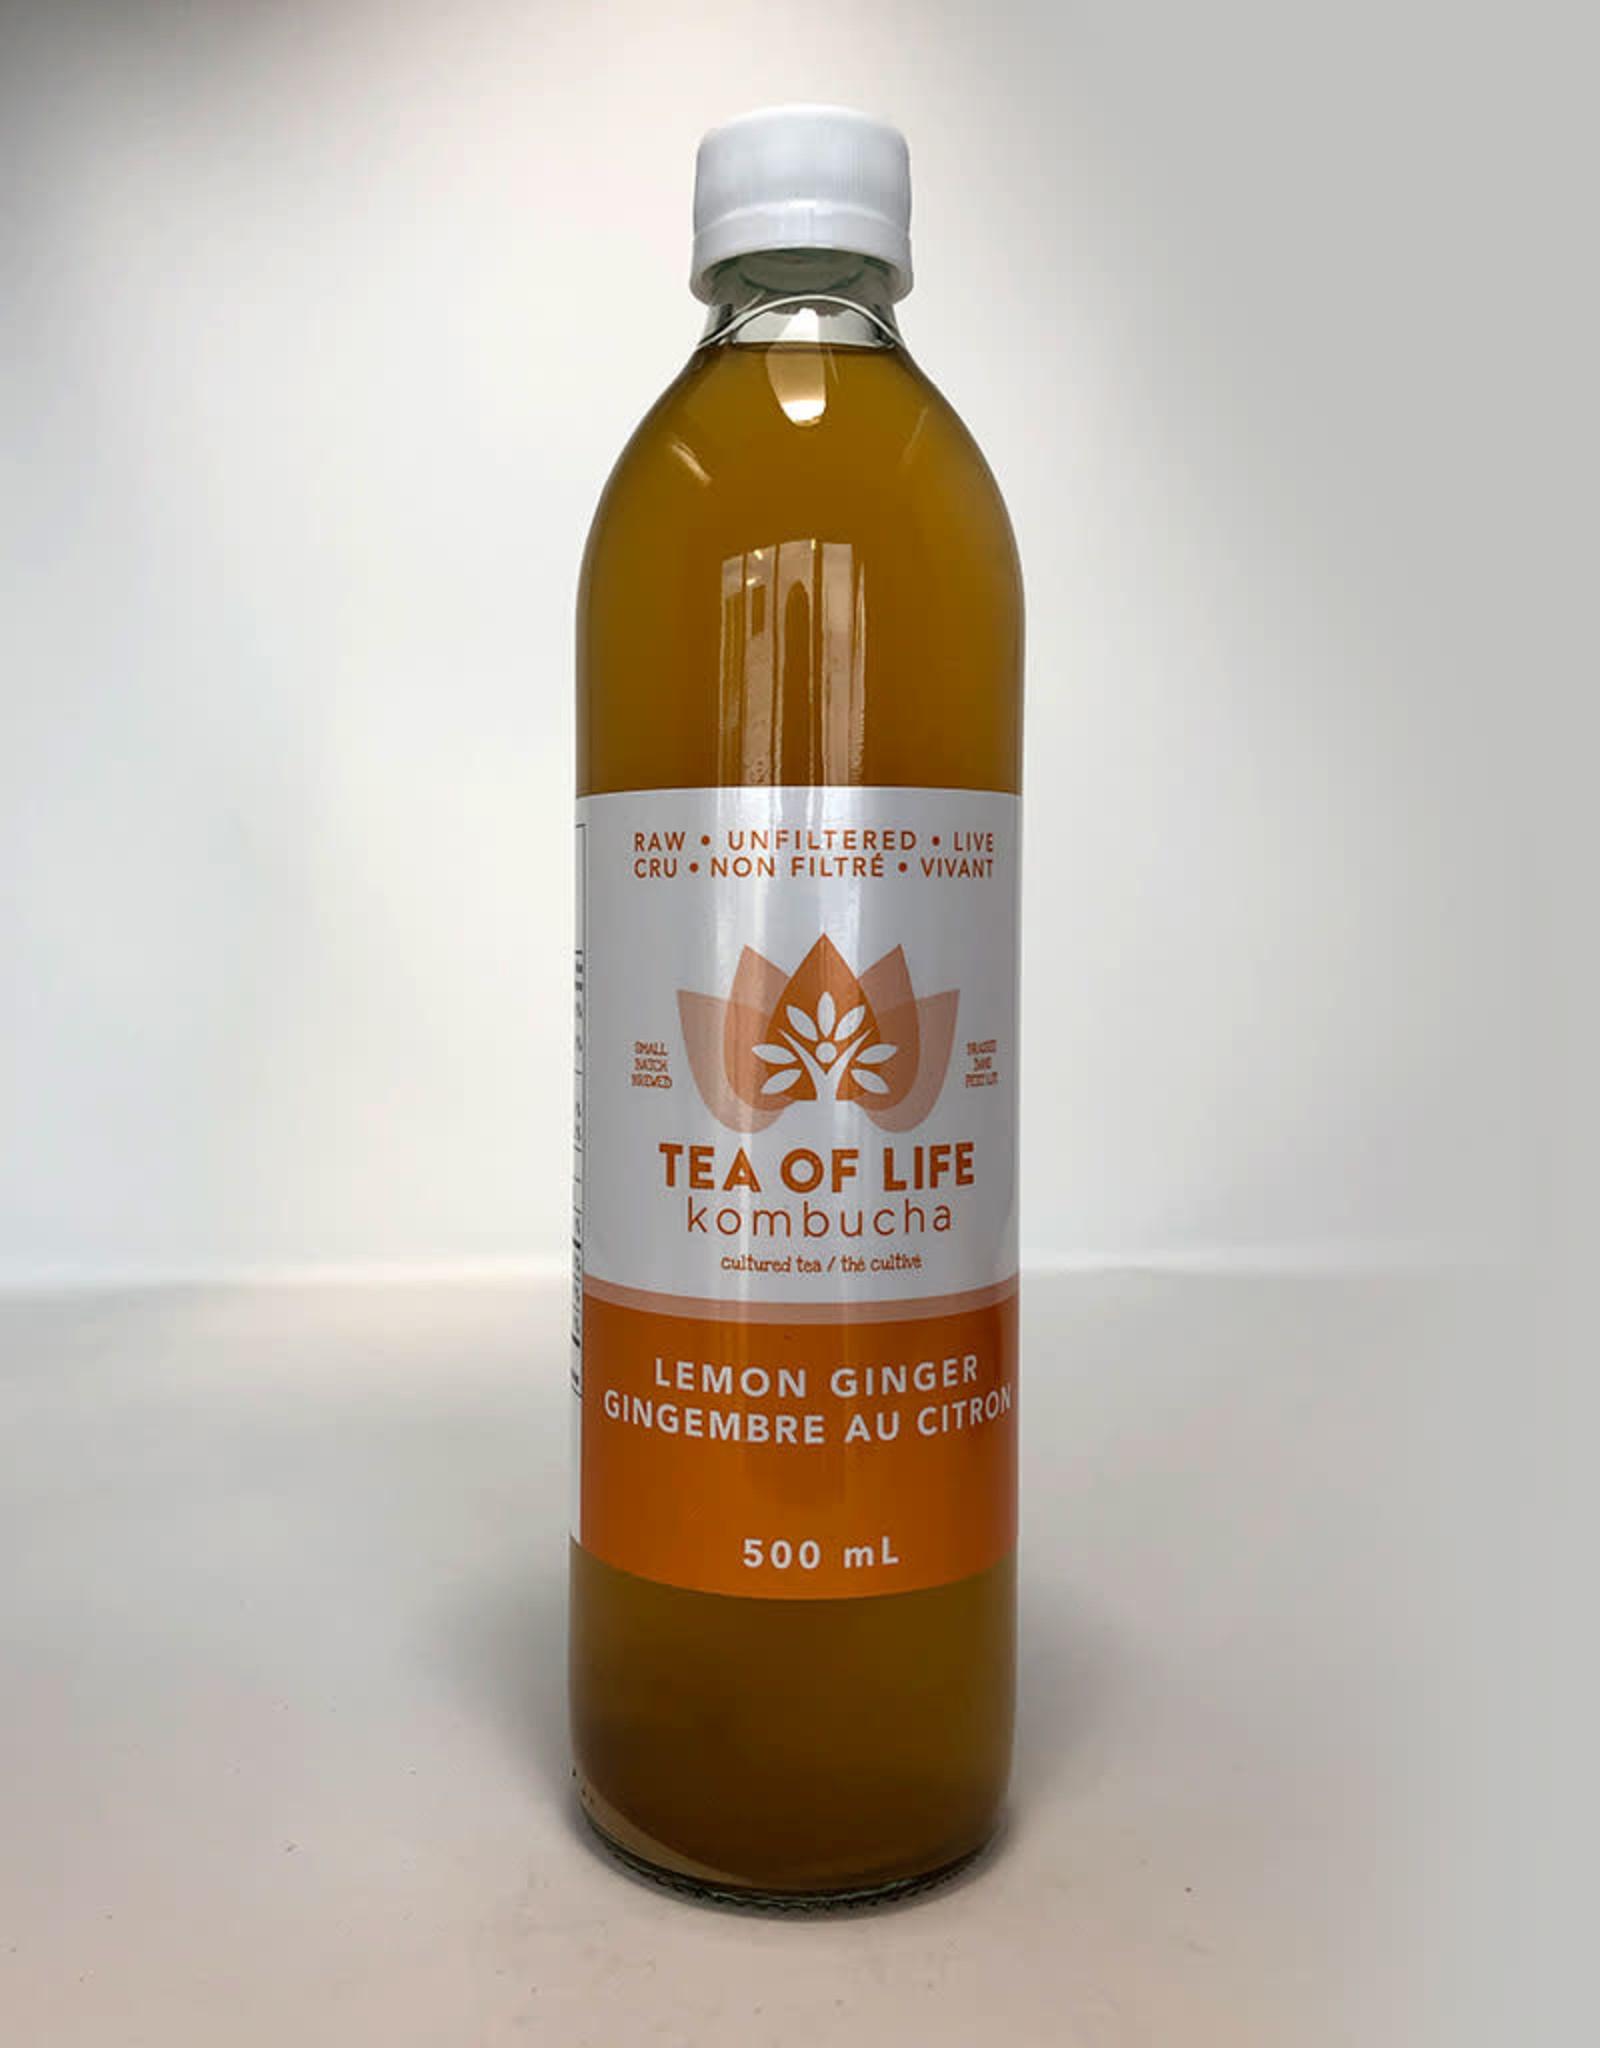 Tea of Life Tea of Life - Kombucha, Lemon Ginger